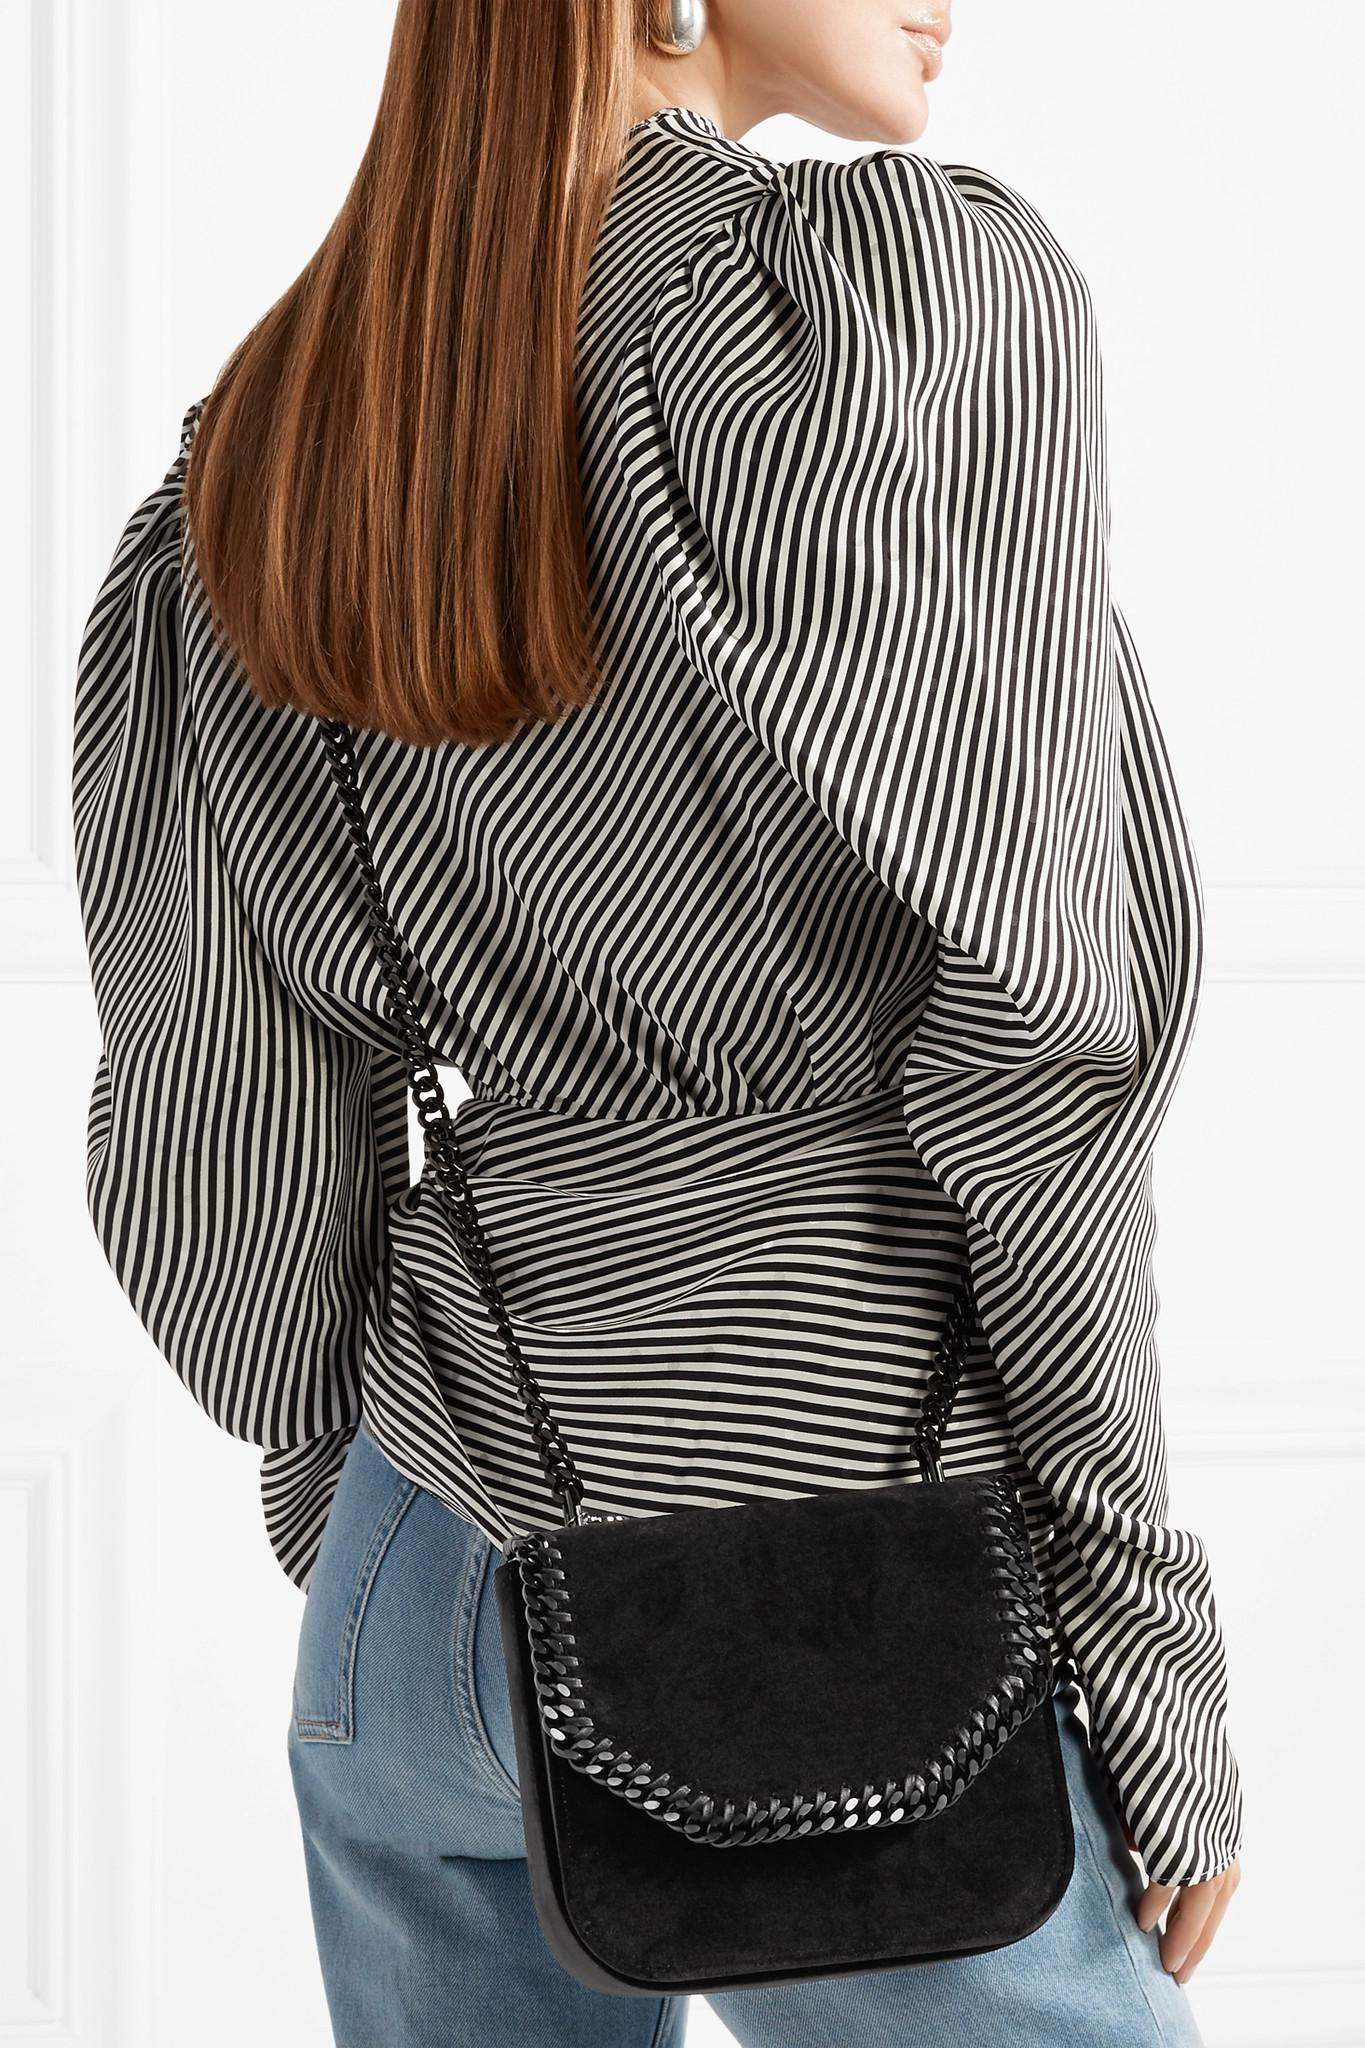 45a9b41b84cb Lyst - Stella McCartney The Falabella Box Medium Velvet Shoulder Bag ...